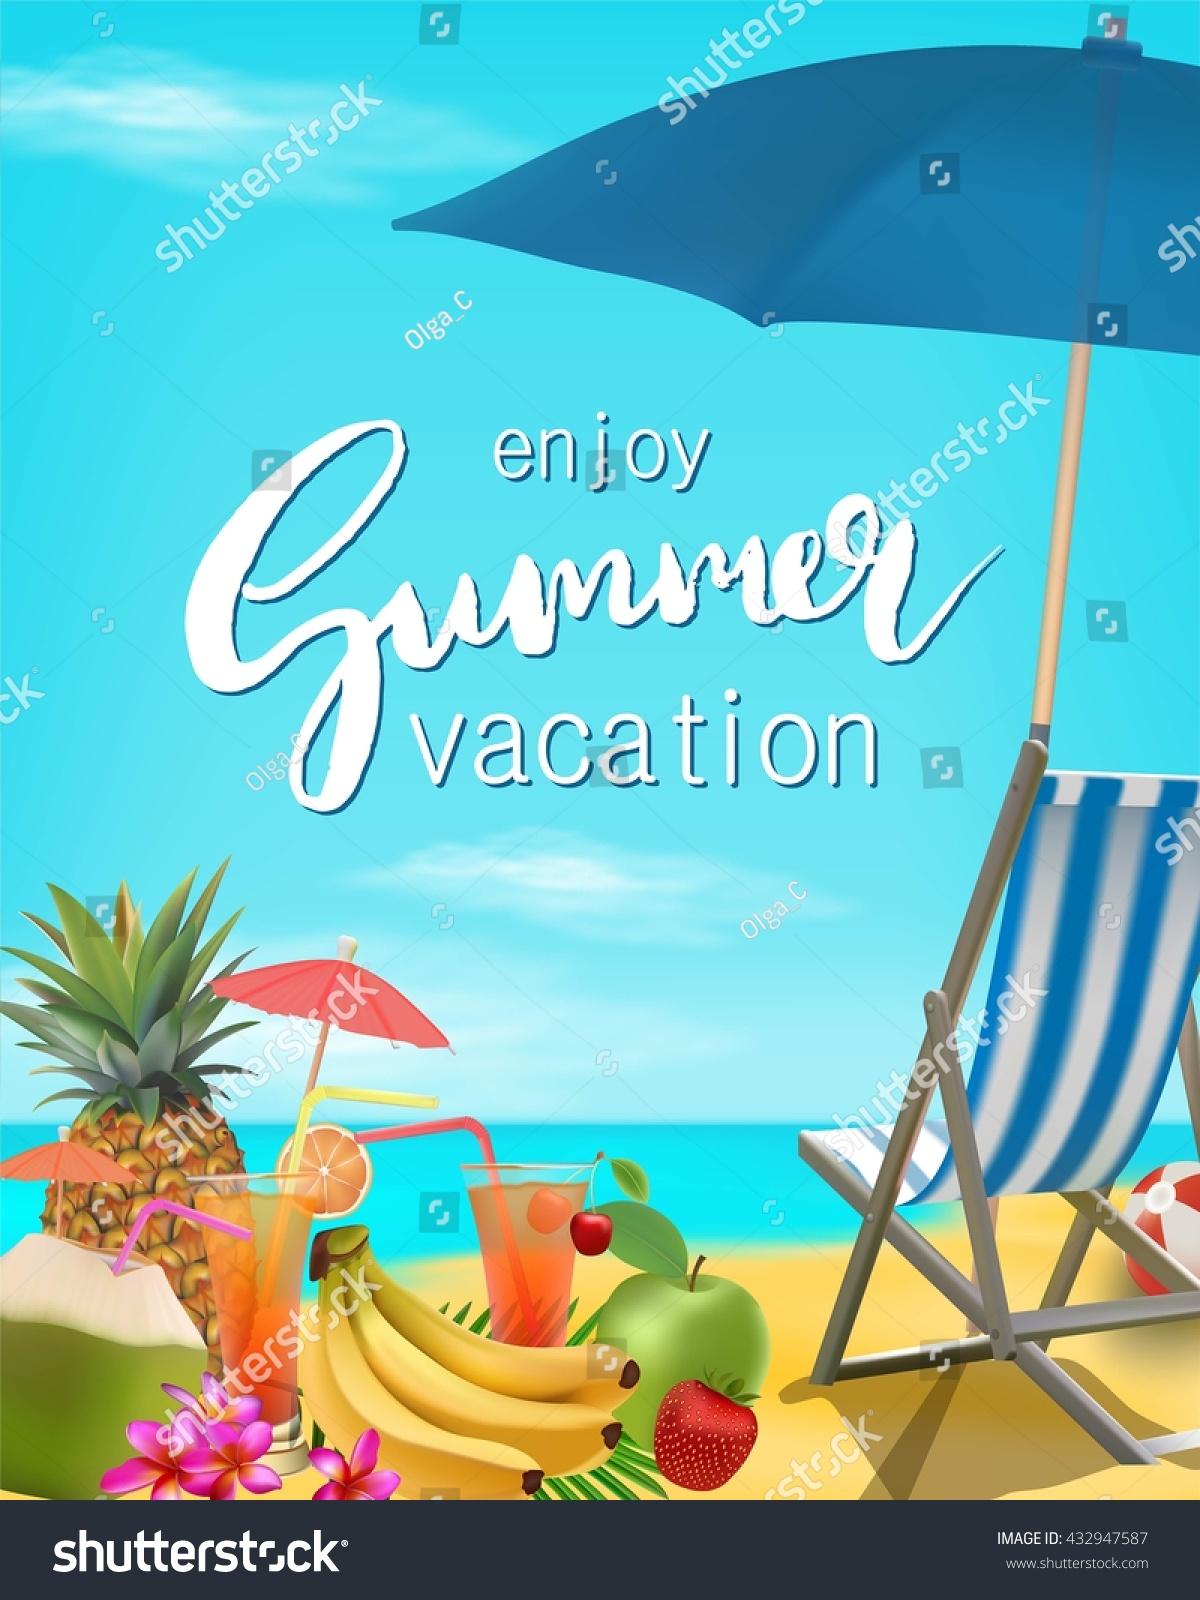 Enjoy the Summer with the Umbrella Caribbean